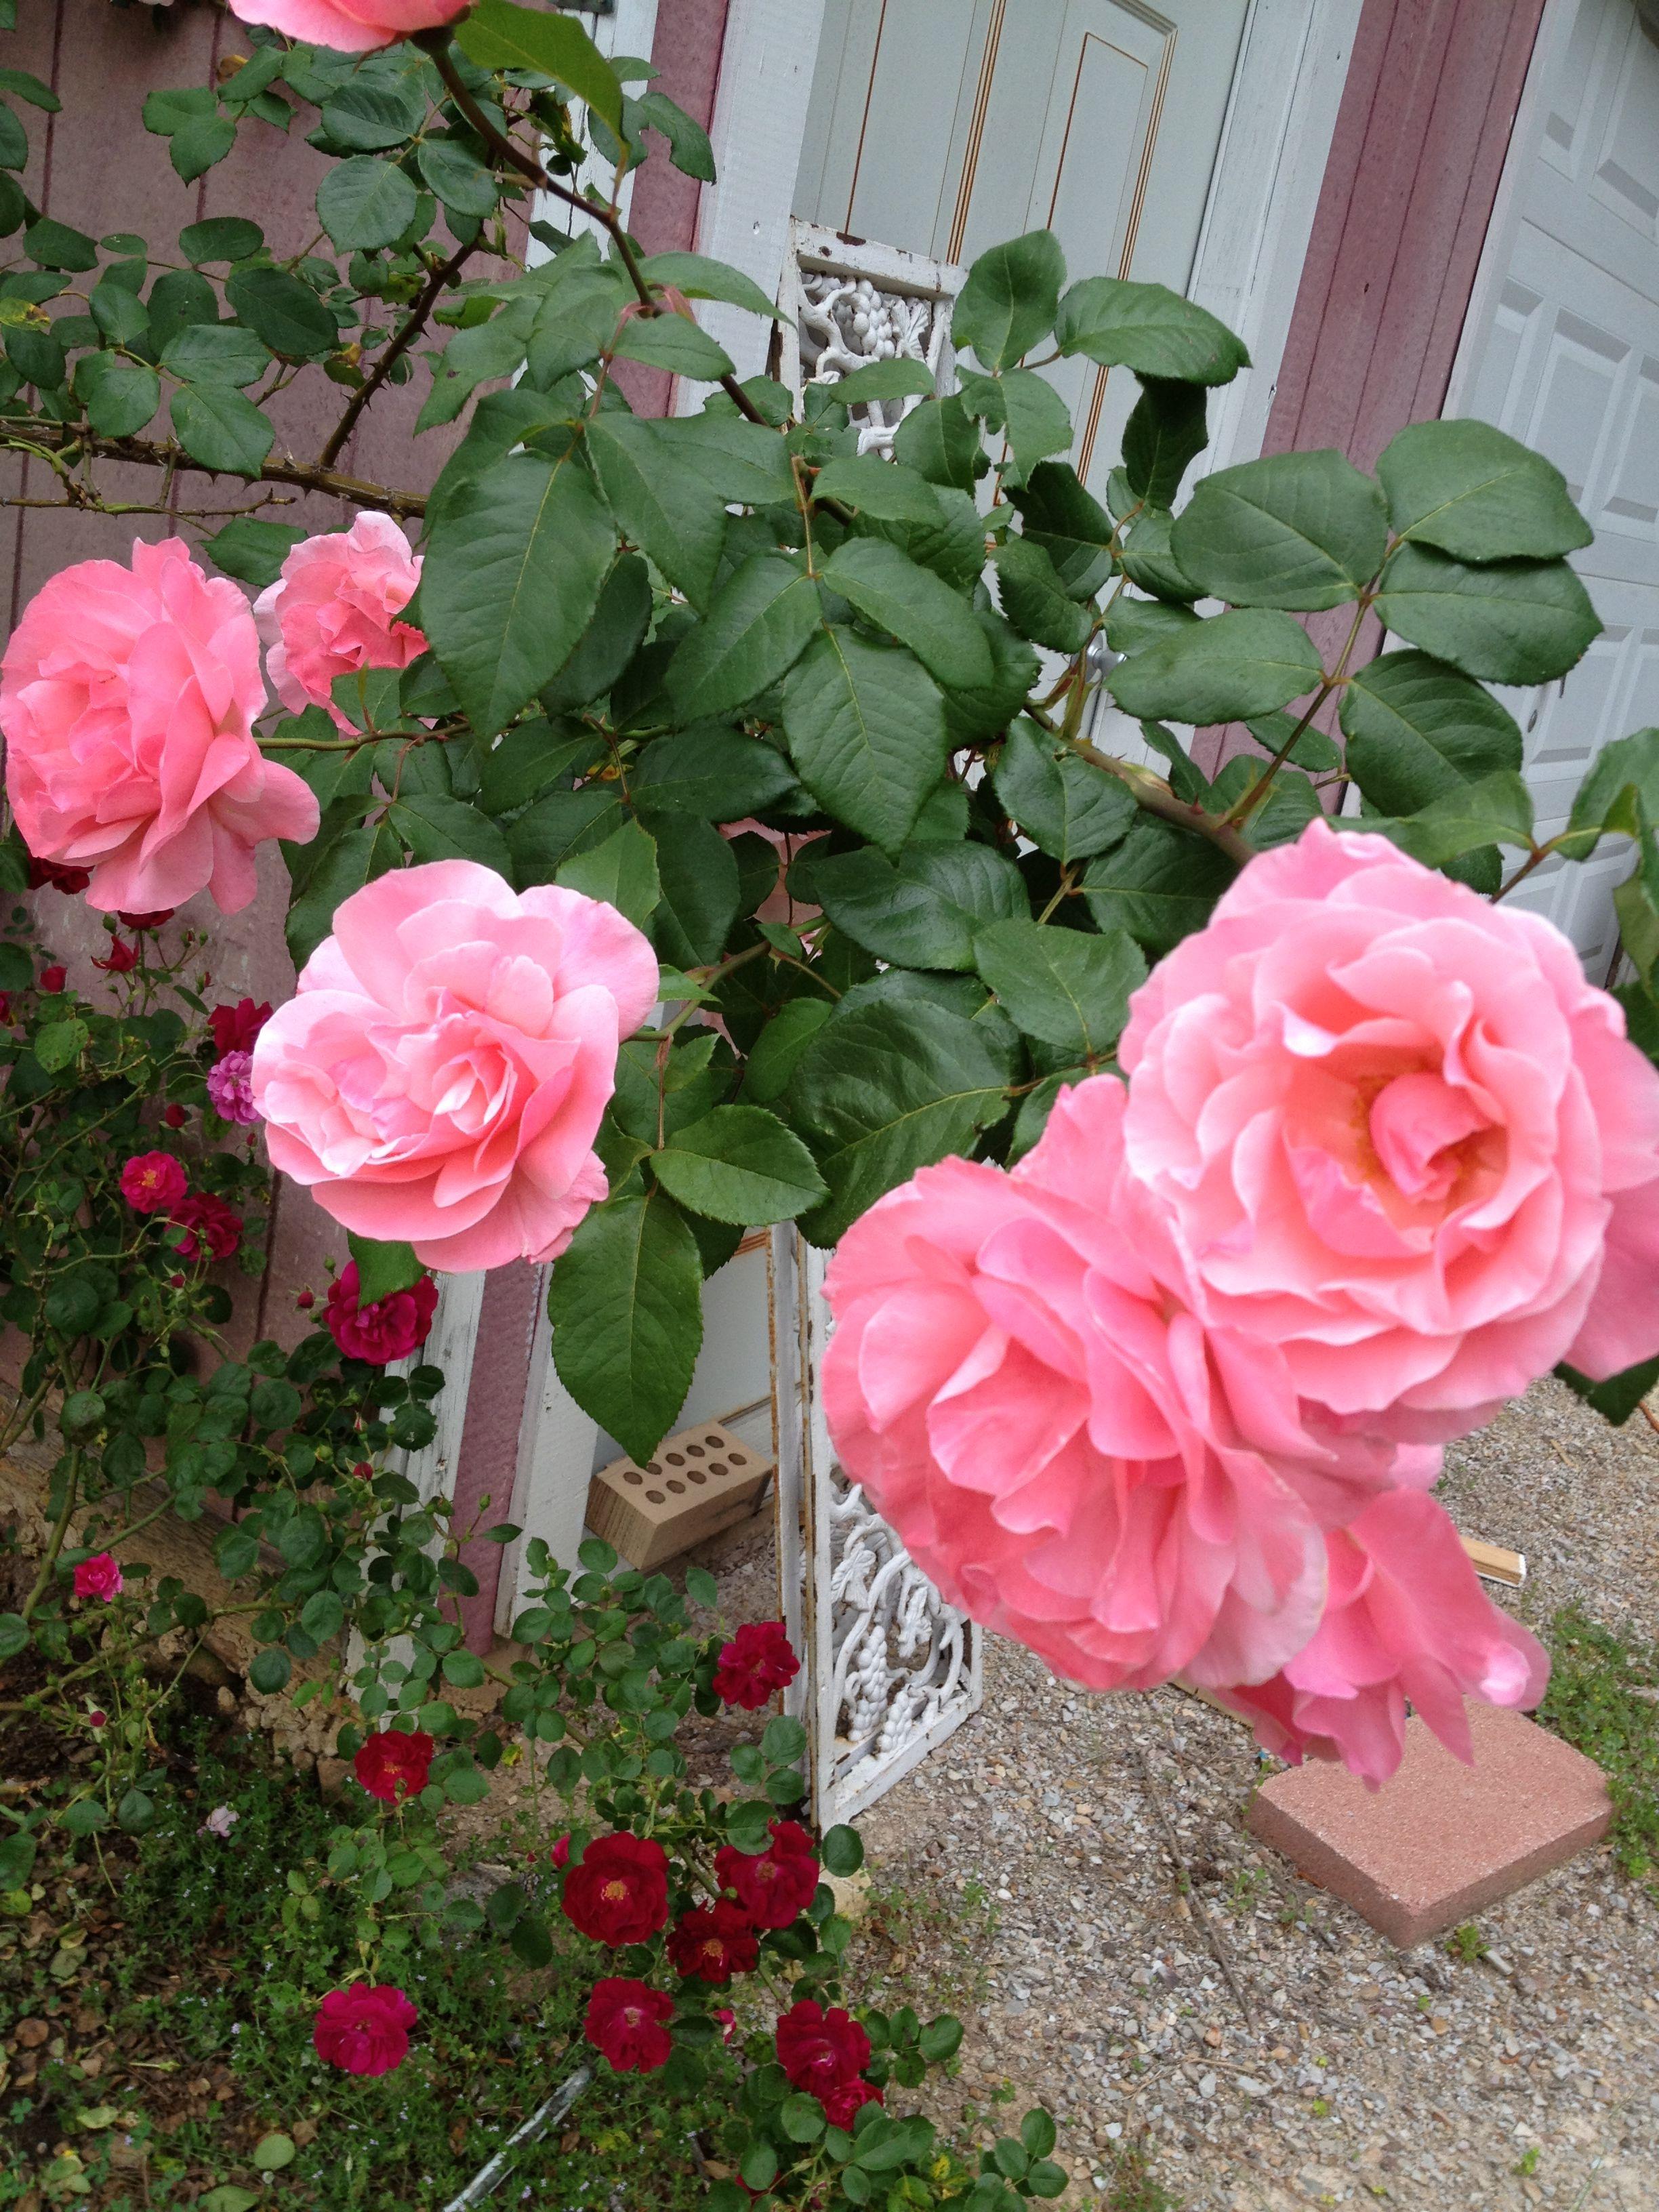 Queen elizabeth pink climbing rose favorite flowers gardens queen elizabeth pink climbing rose mightylinksfo